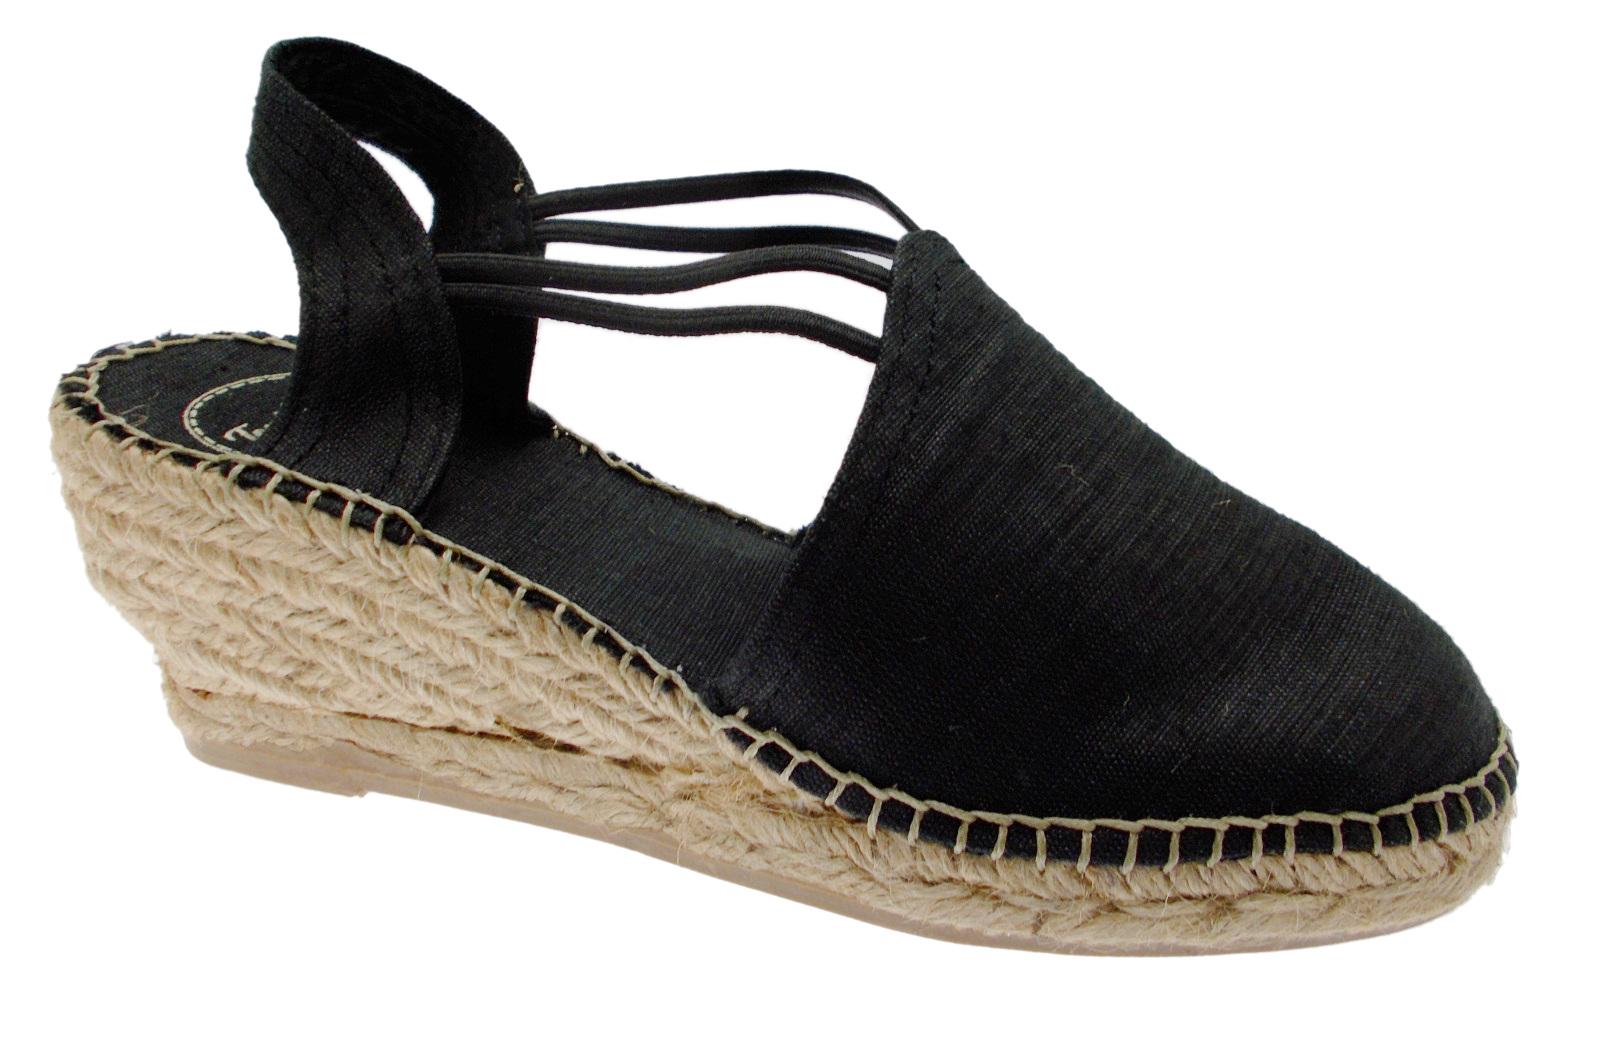 Descuento por tiempo limitado TURIA espadrillas nera sandalo donna corda Toni Pons